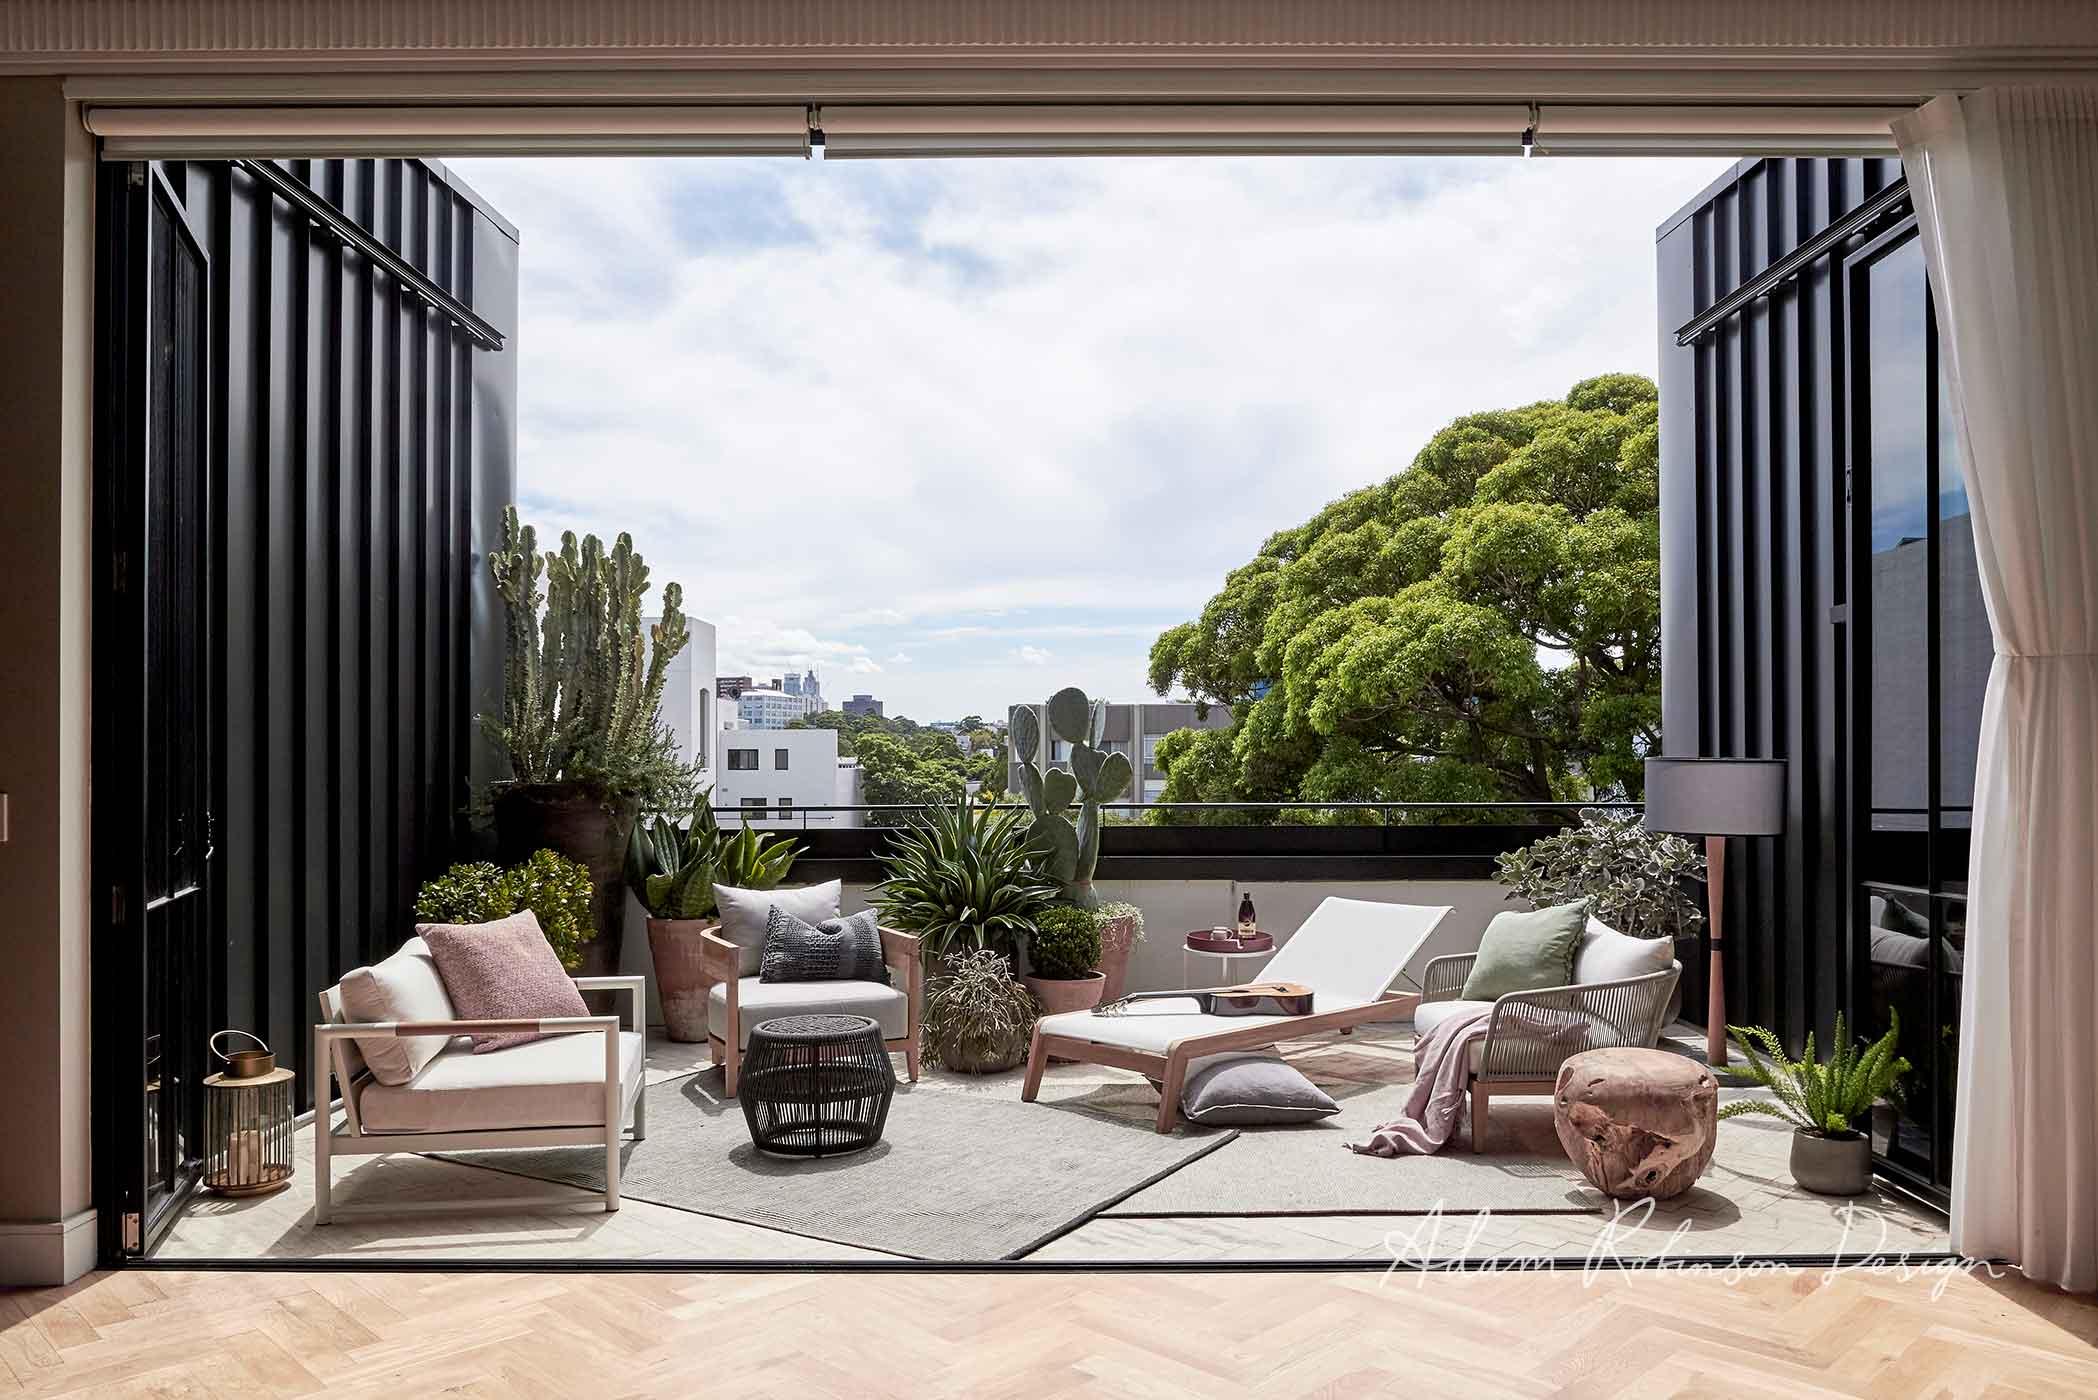 ©-Adam-Robinson-Design-Collaboration-Harbour-Outdoor-1976-One-Balcony-Four-Ways-Boho.jpg